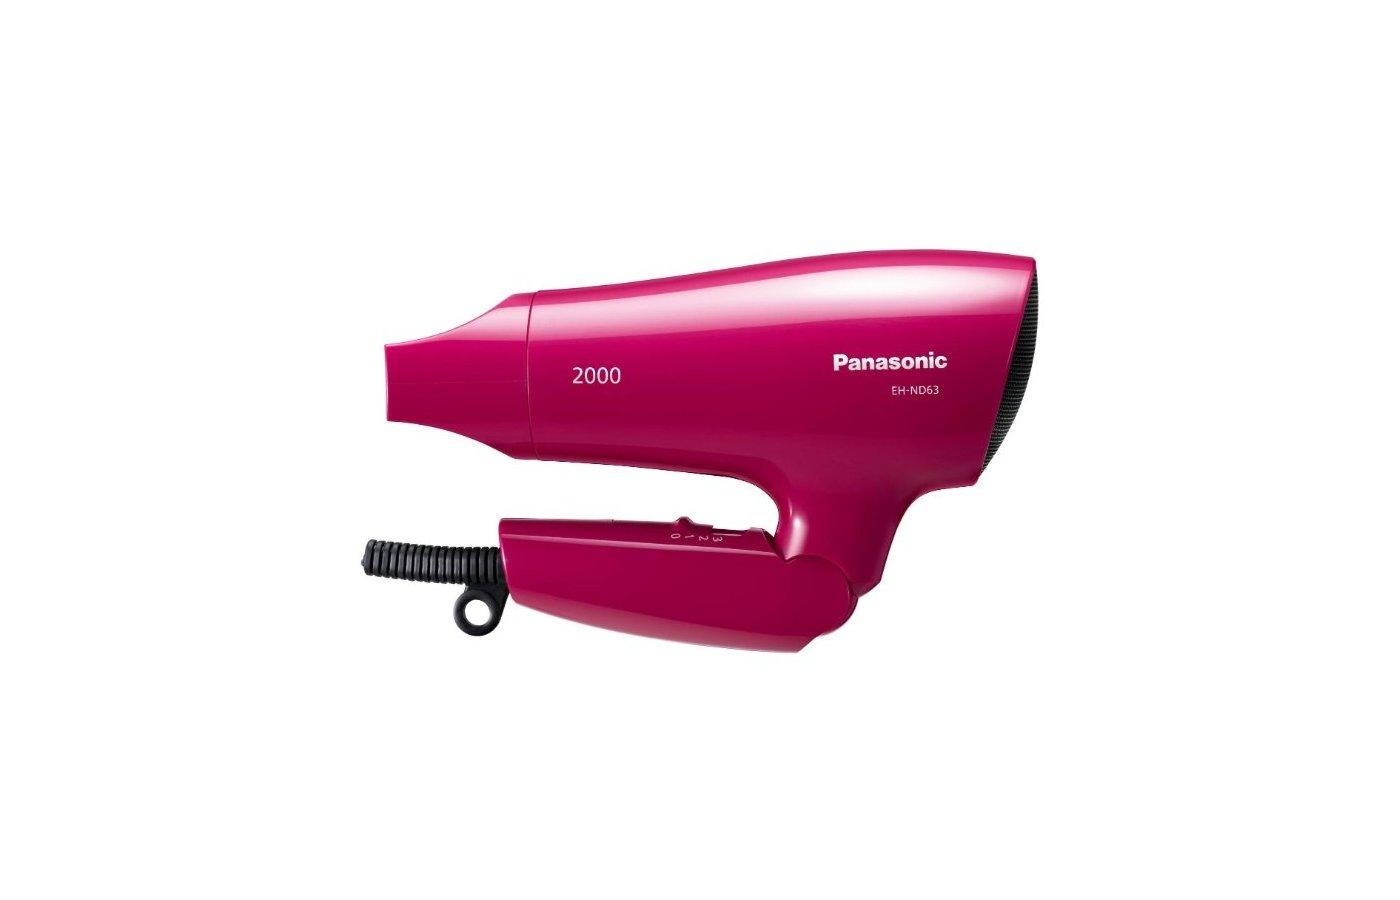 Фен Panasonic EH-ND64-P865 2